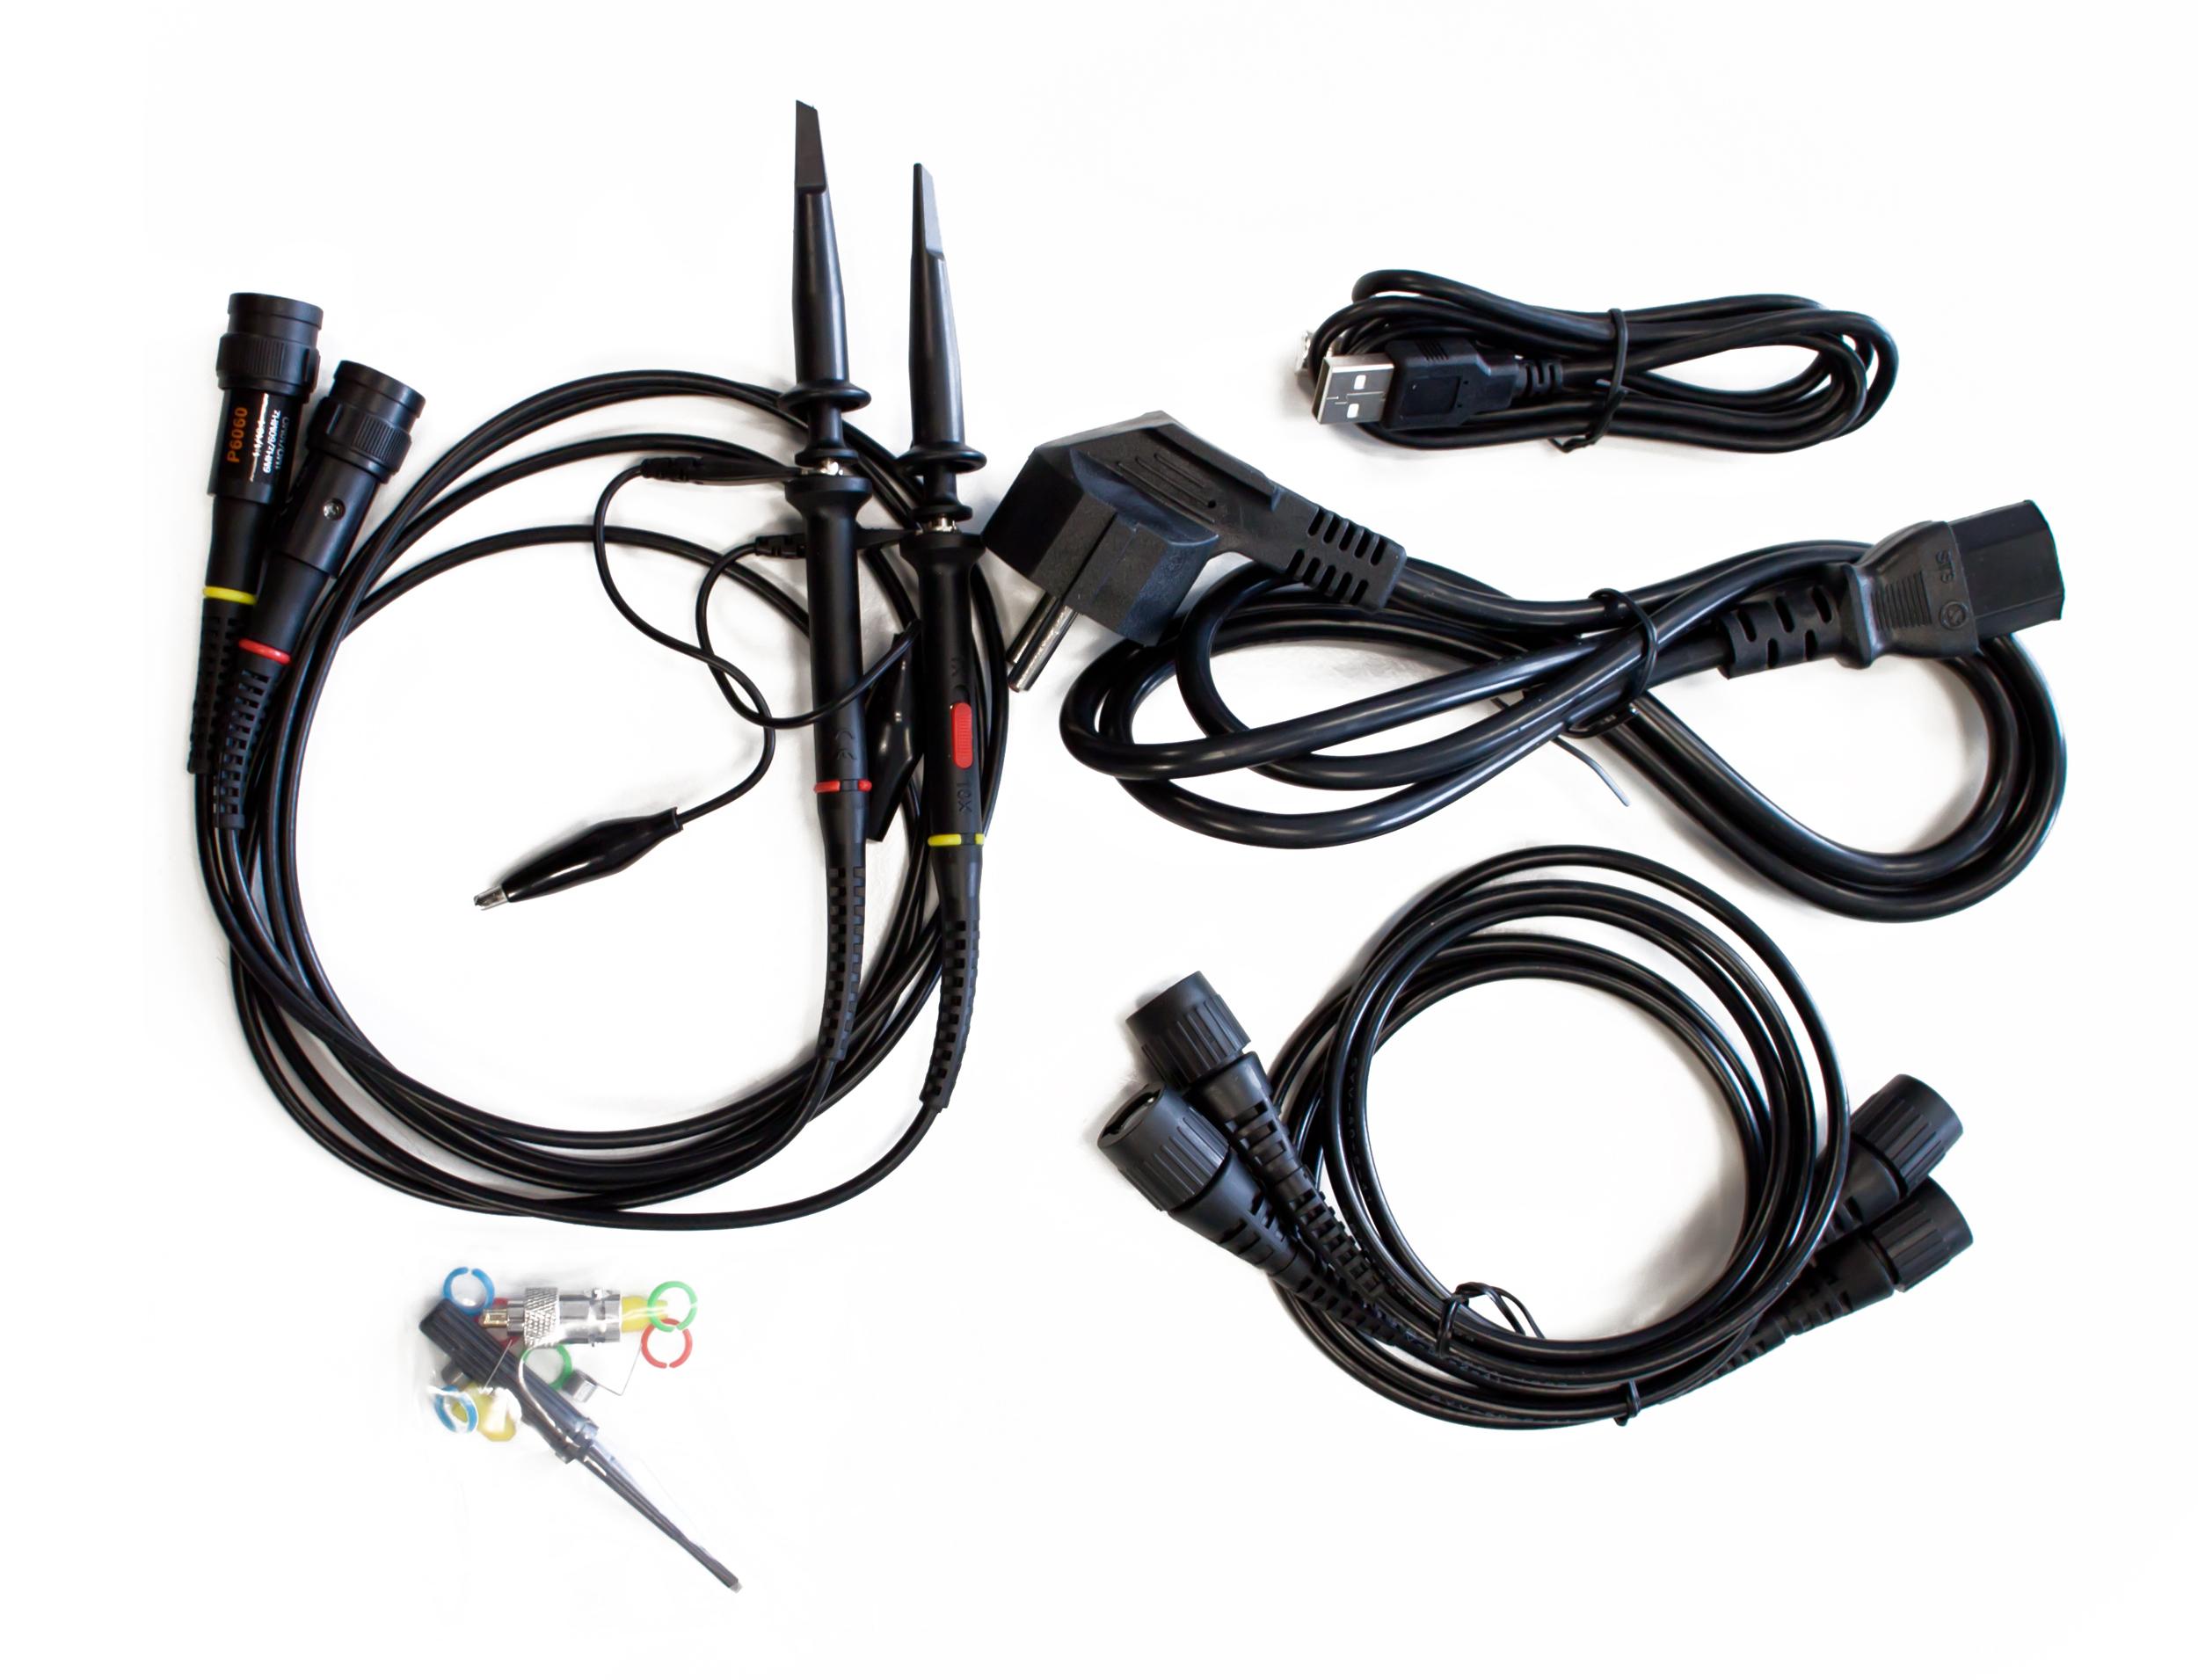 «PeakTech® P 1265» 30 MHz/2CH, 250 MS/s, Digital Storage Oscilloscope